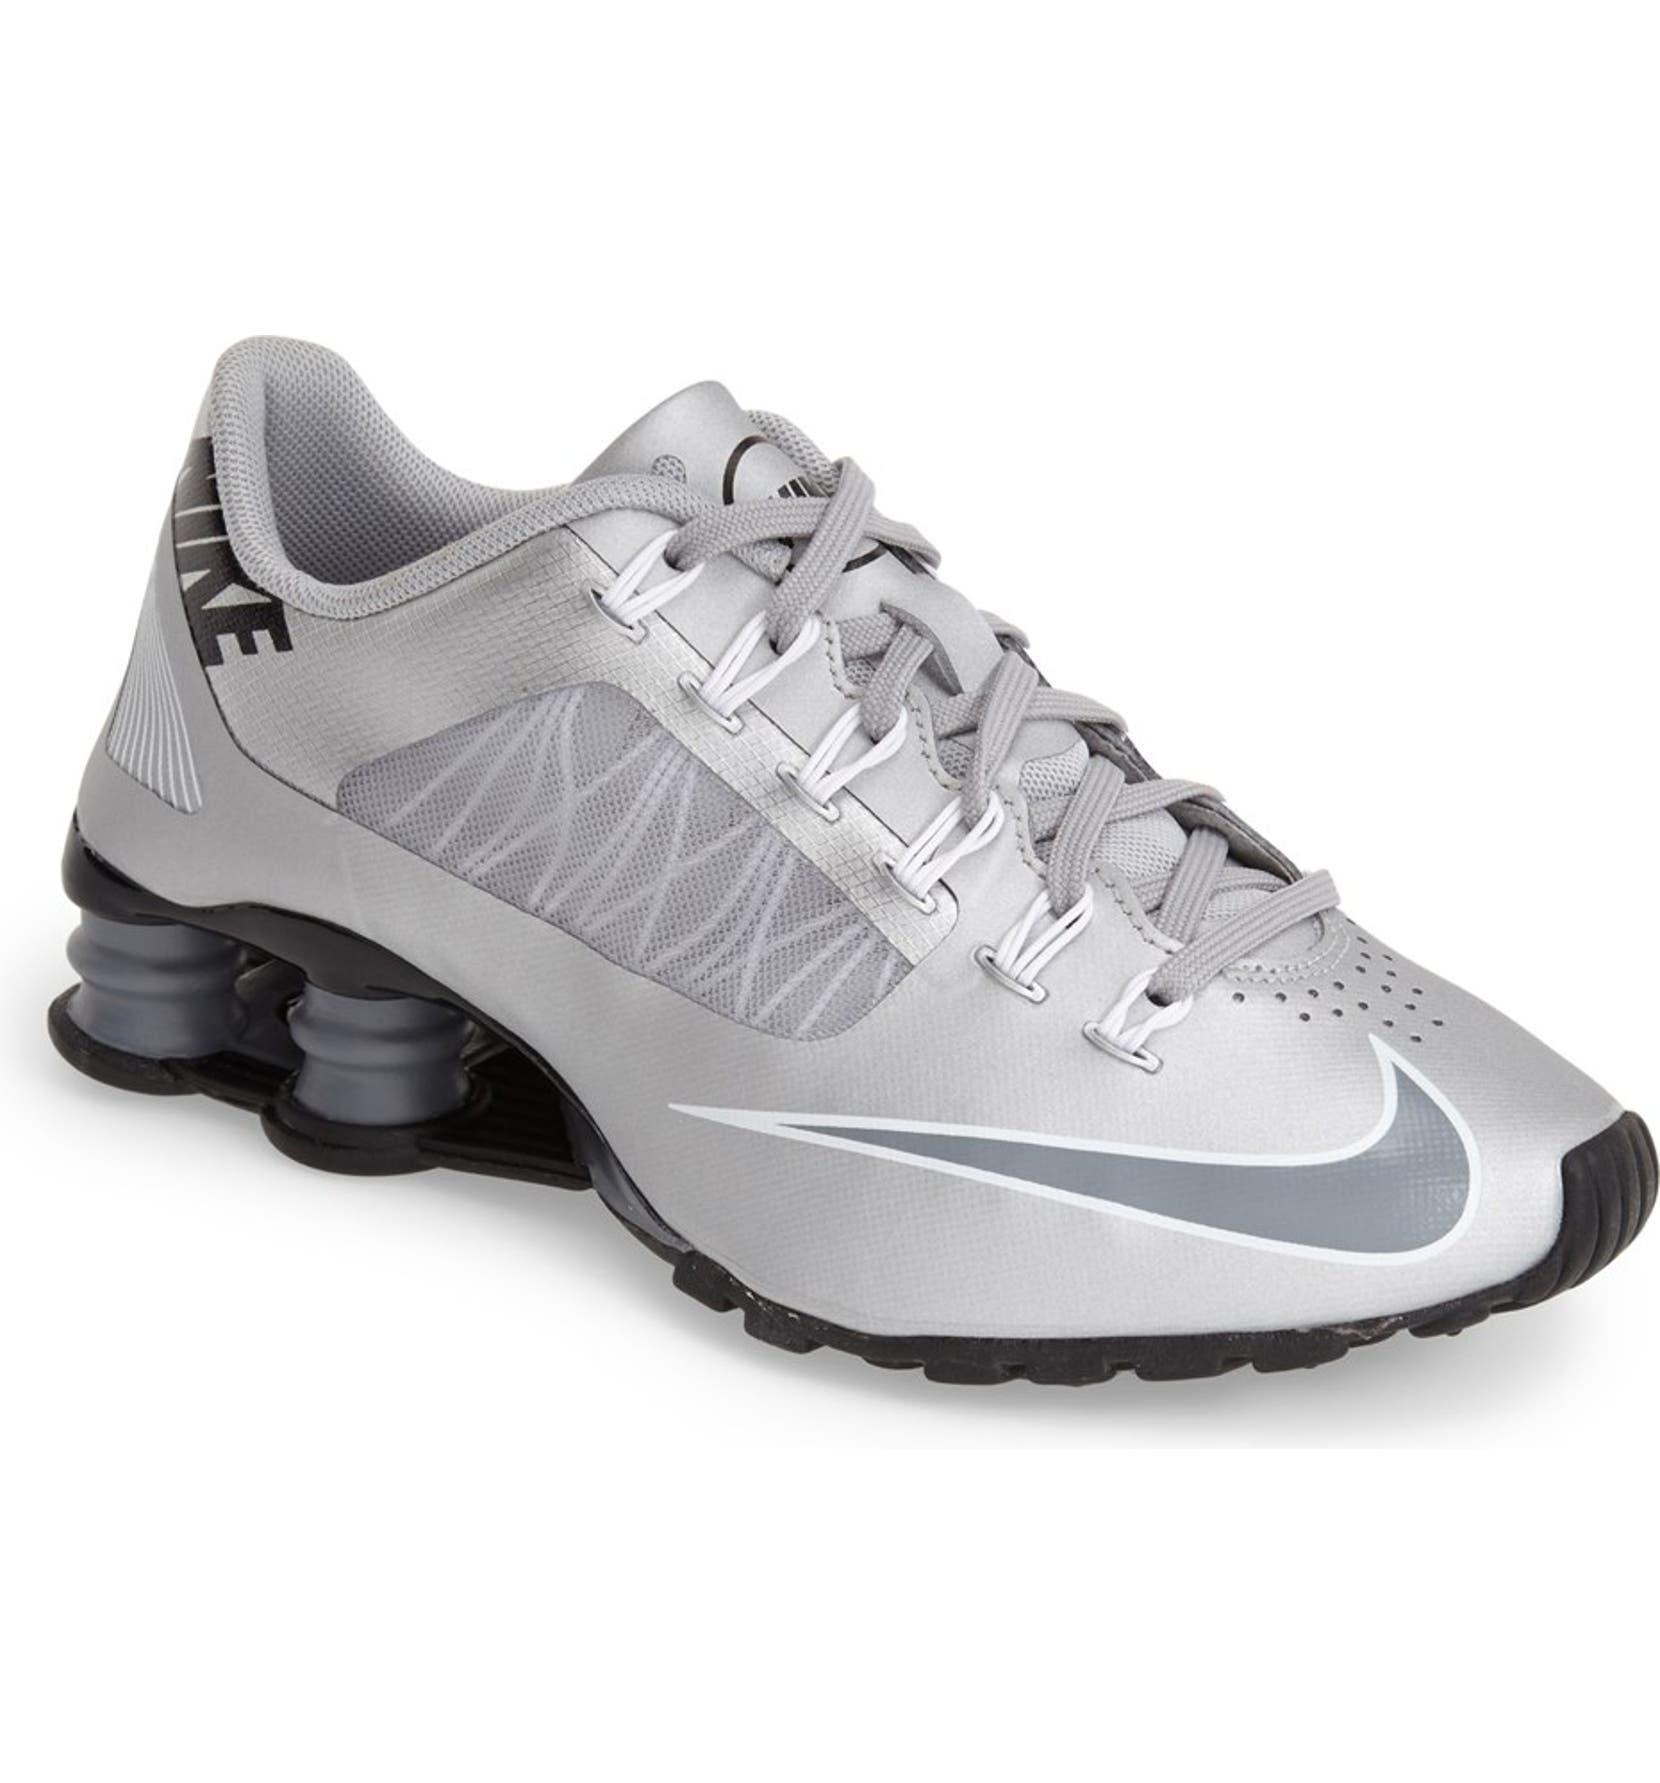 promo code 1a1b0 584fc Nike  Shox Superfly R4  Running Shoe (Women)   Nordstrom